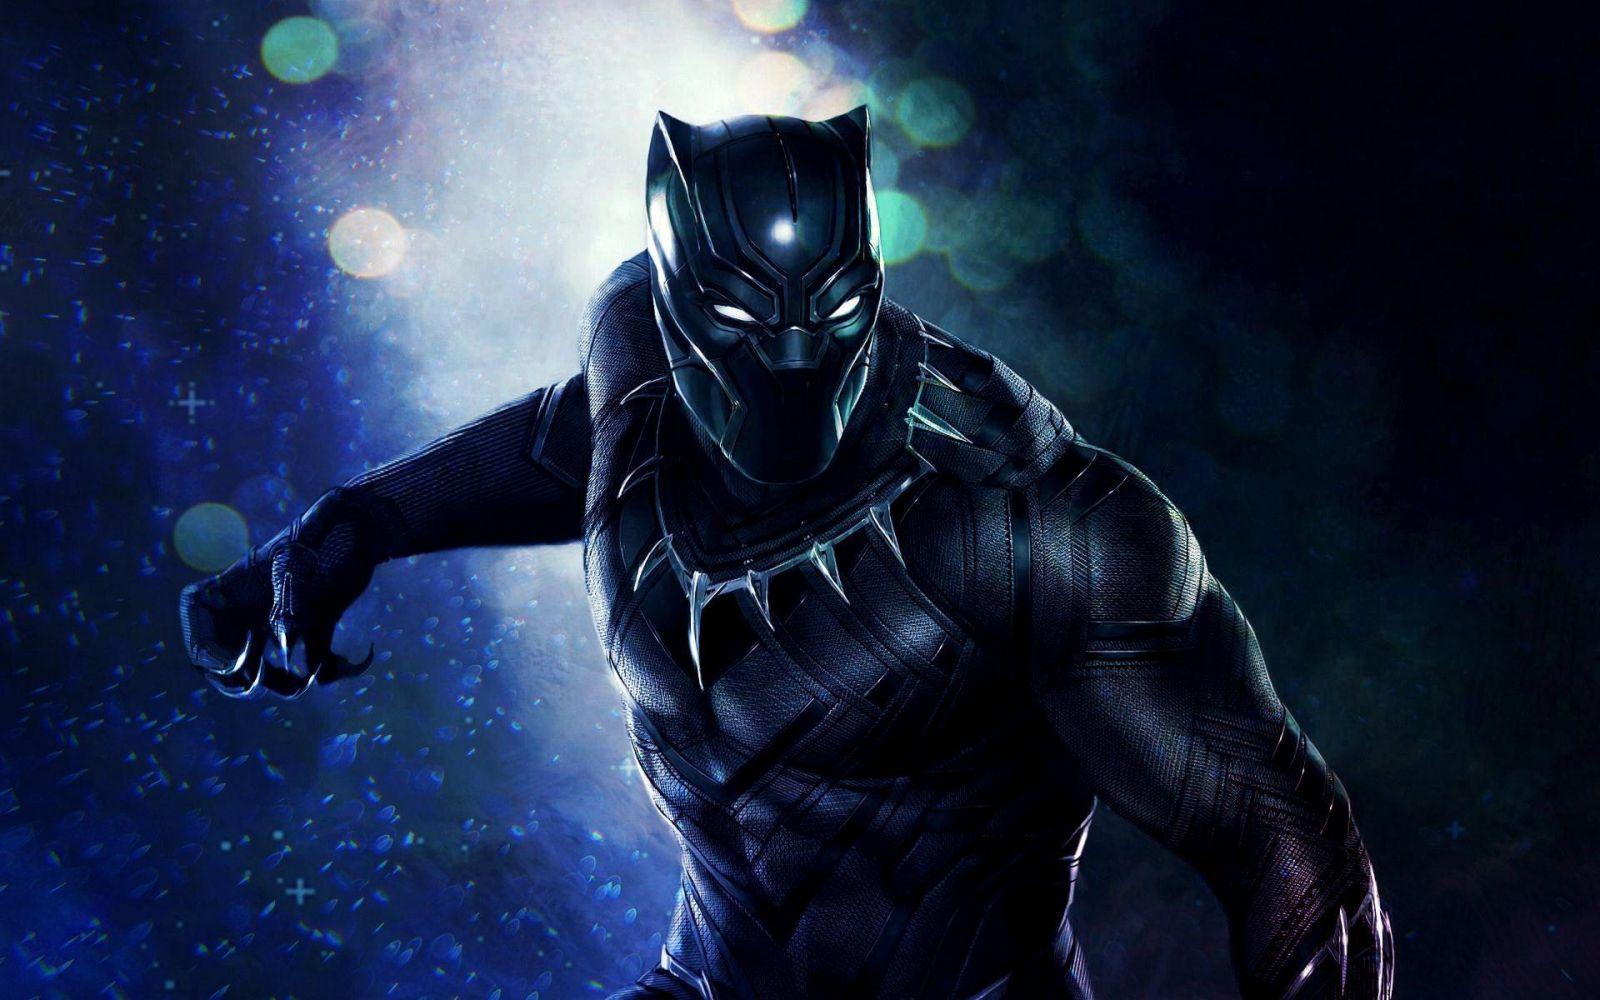 black-panther-hd-wallpaper.jpg